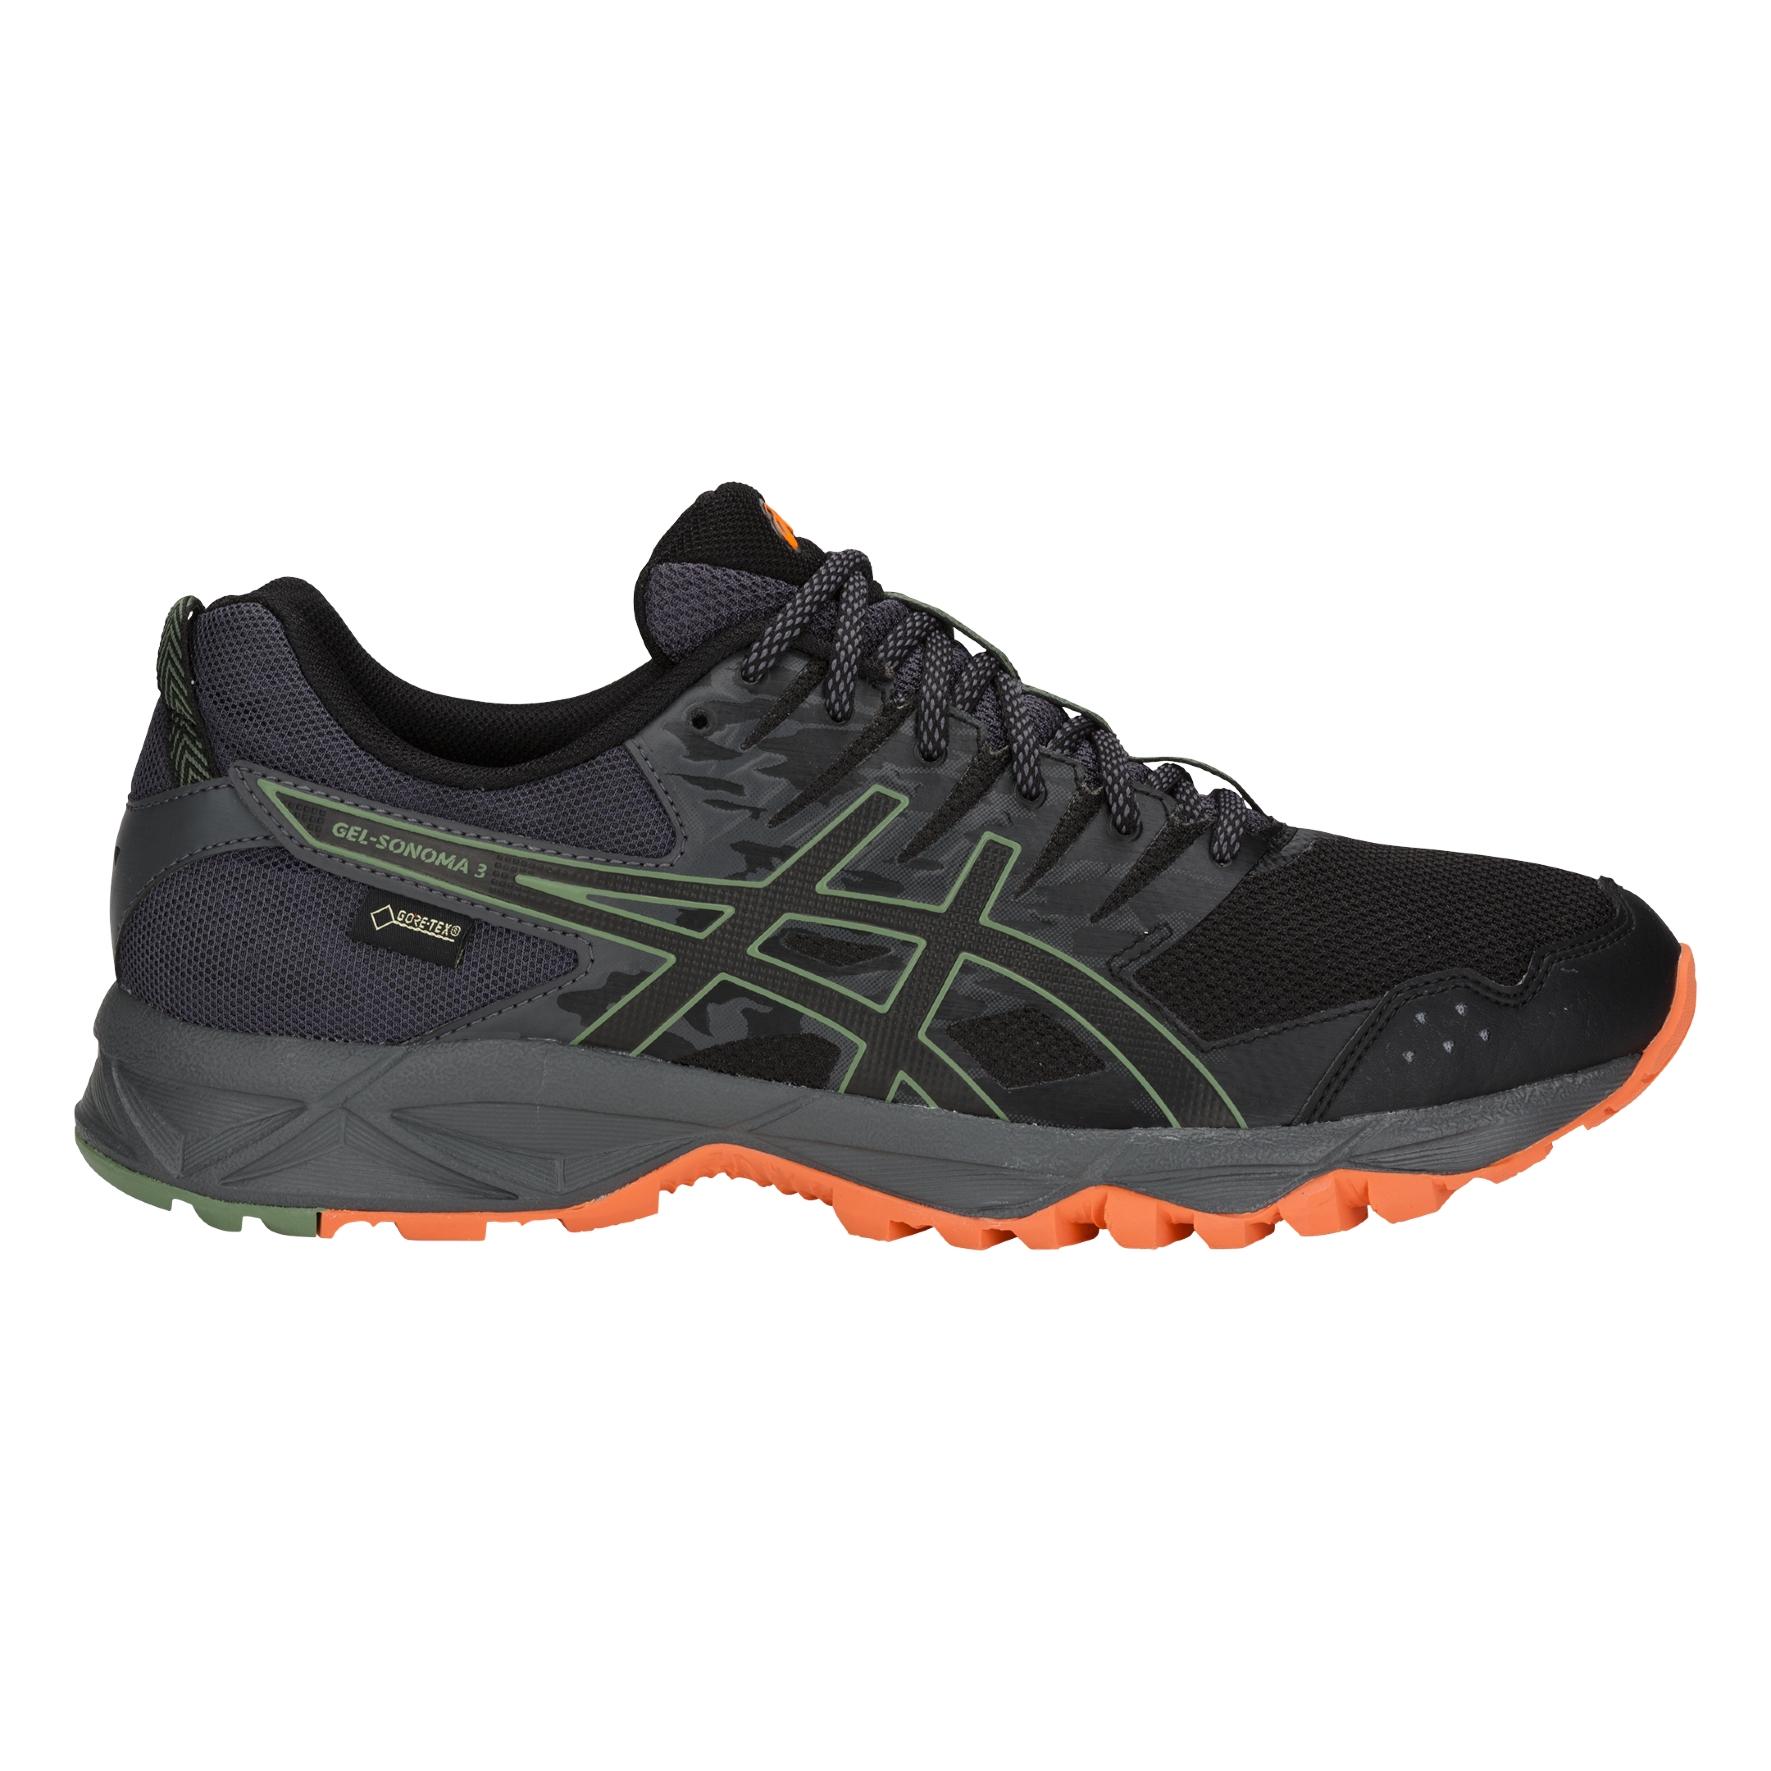 sélection premium c01f6 69a82 Chaussures Asics Gel-Sonoma 3 G-TX